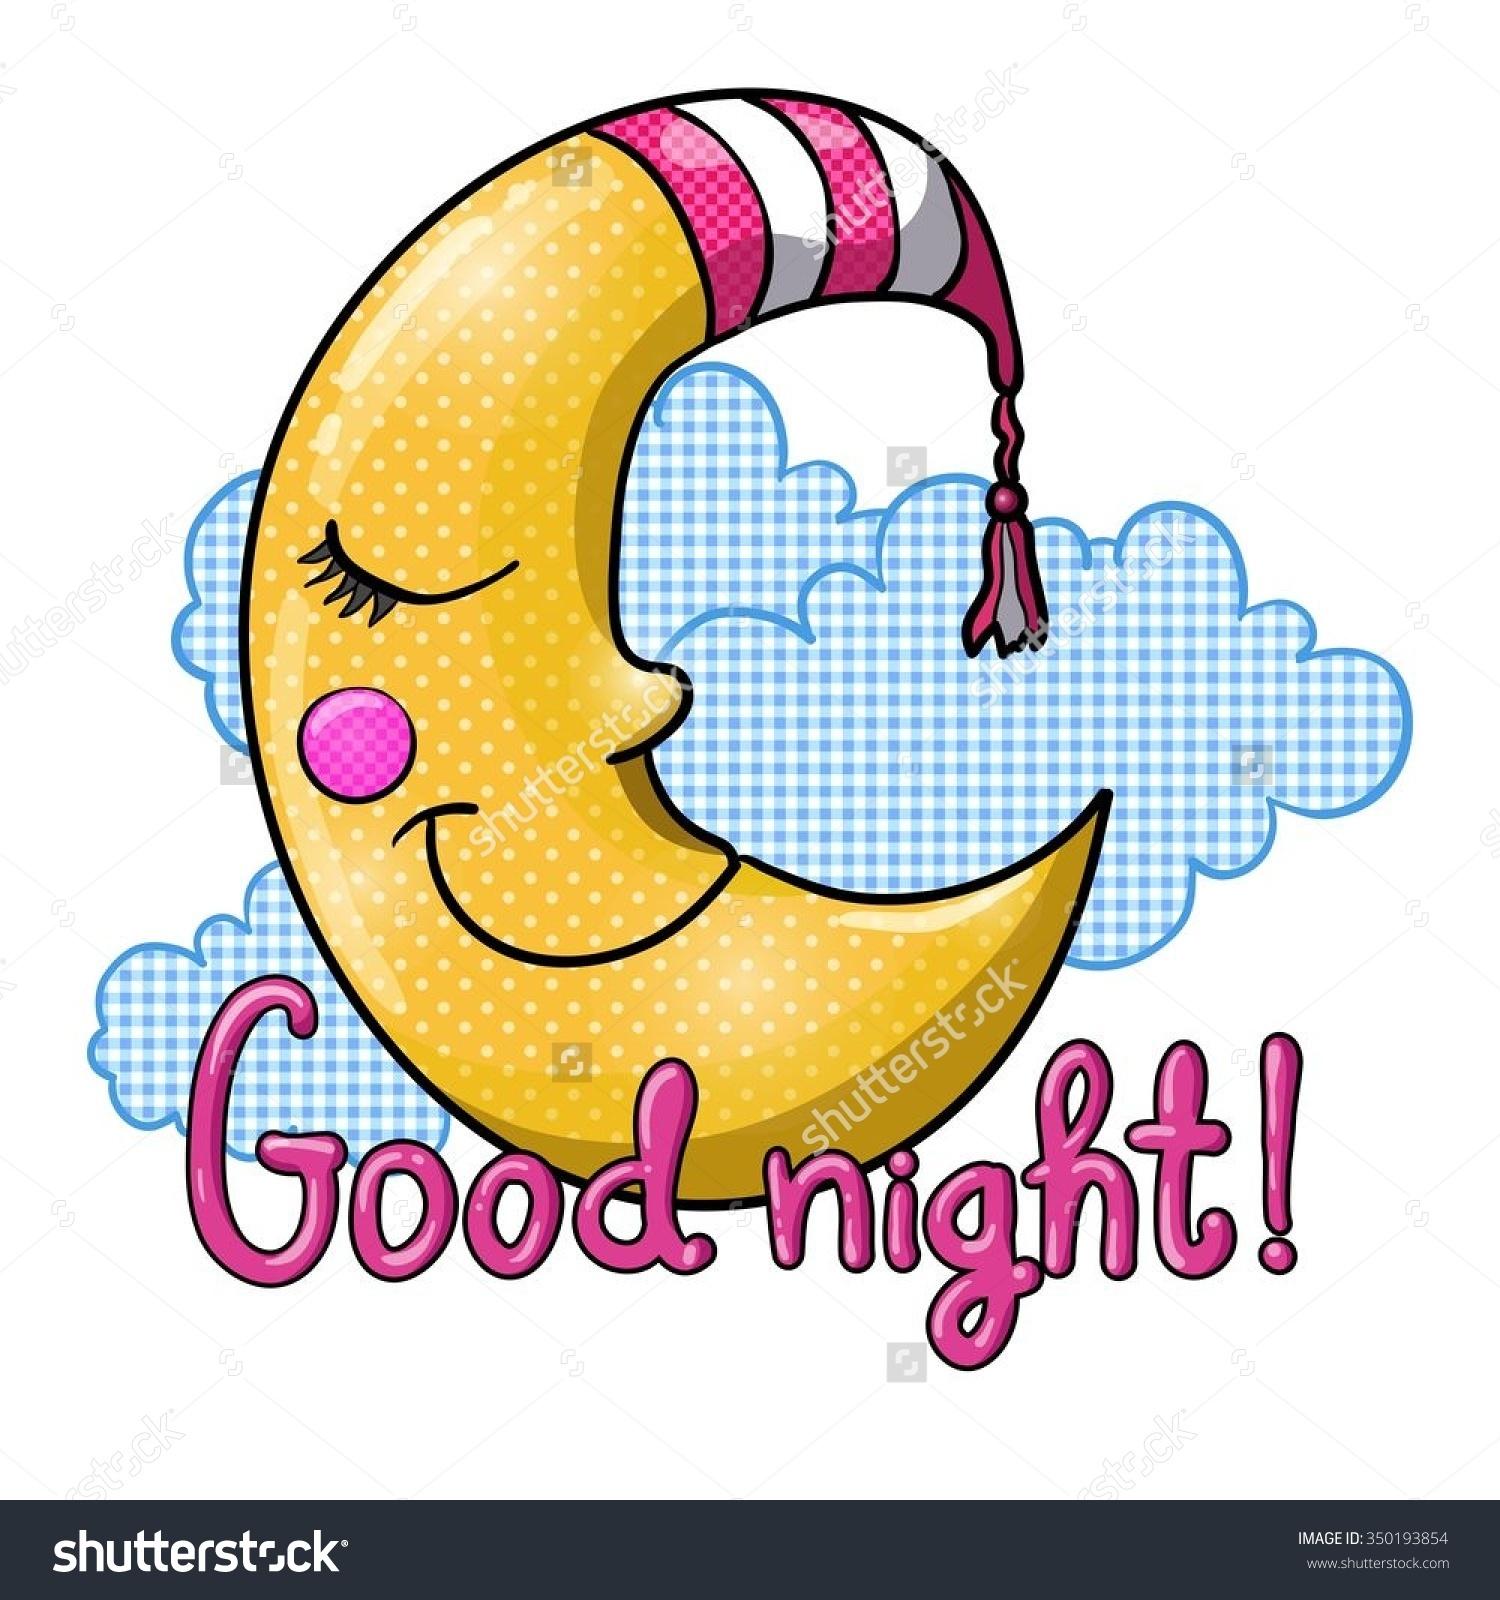 Good Night! Good Night! Goodnight Everyone Clipart